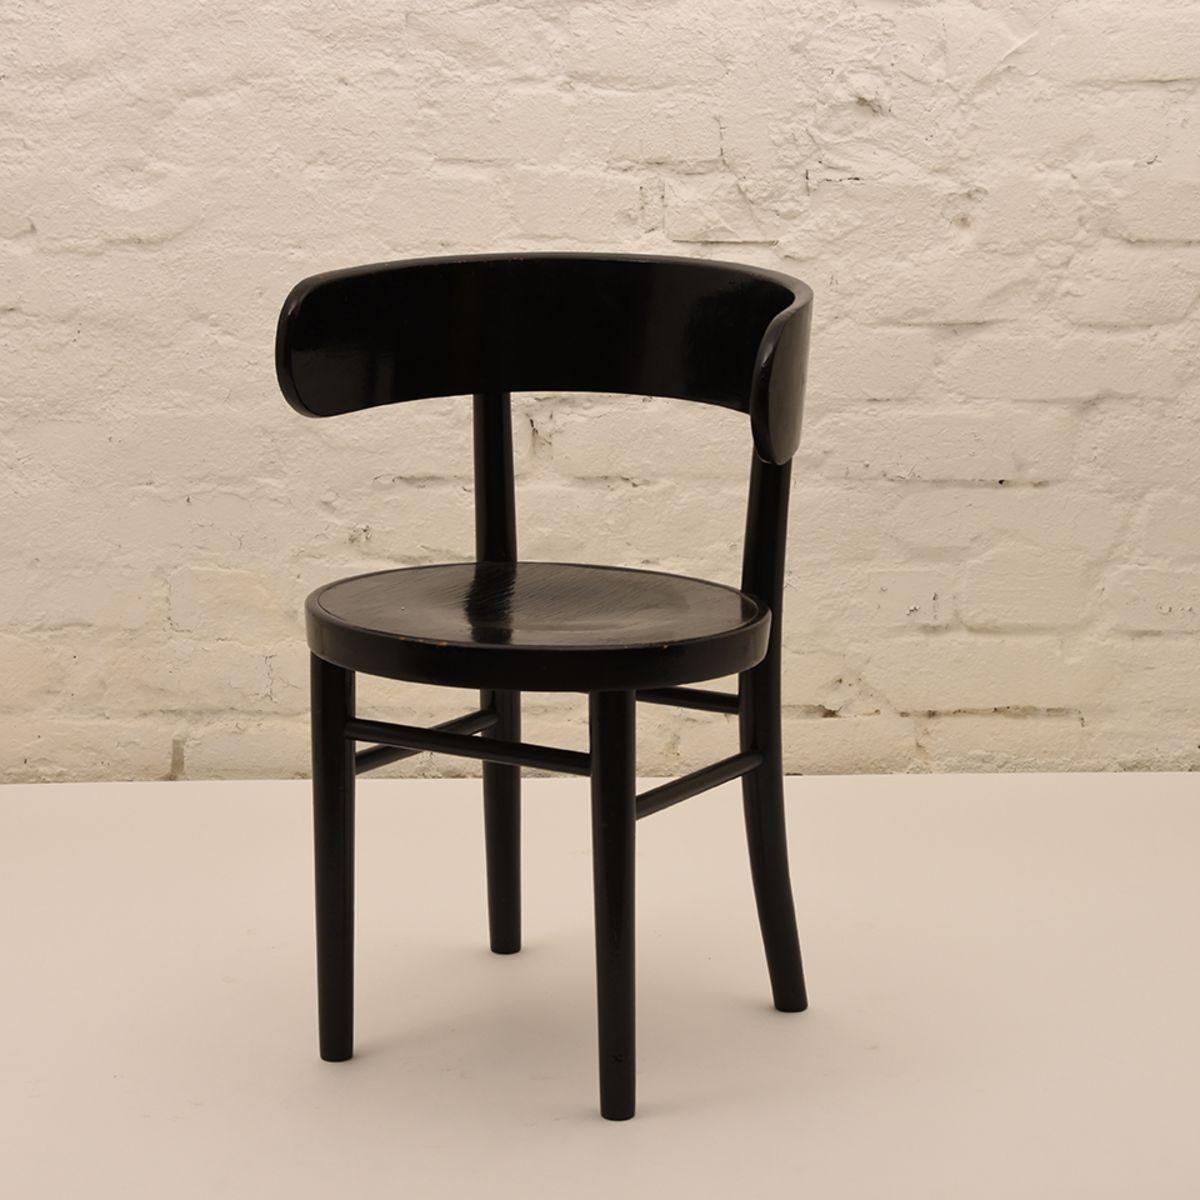 Werner-West_Side-Chair-Black